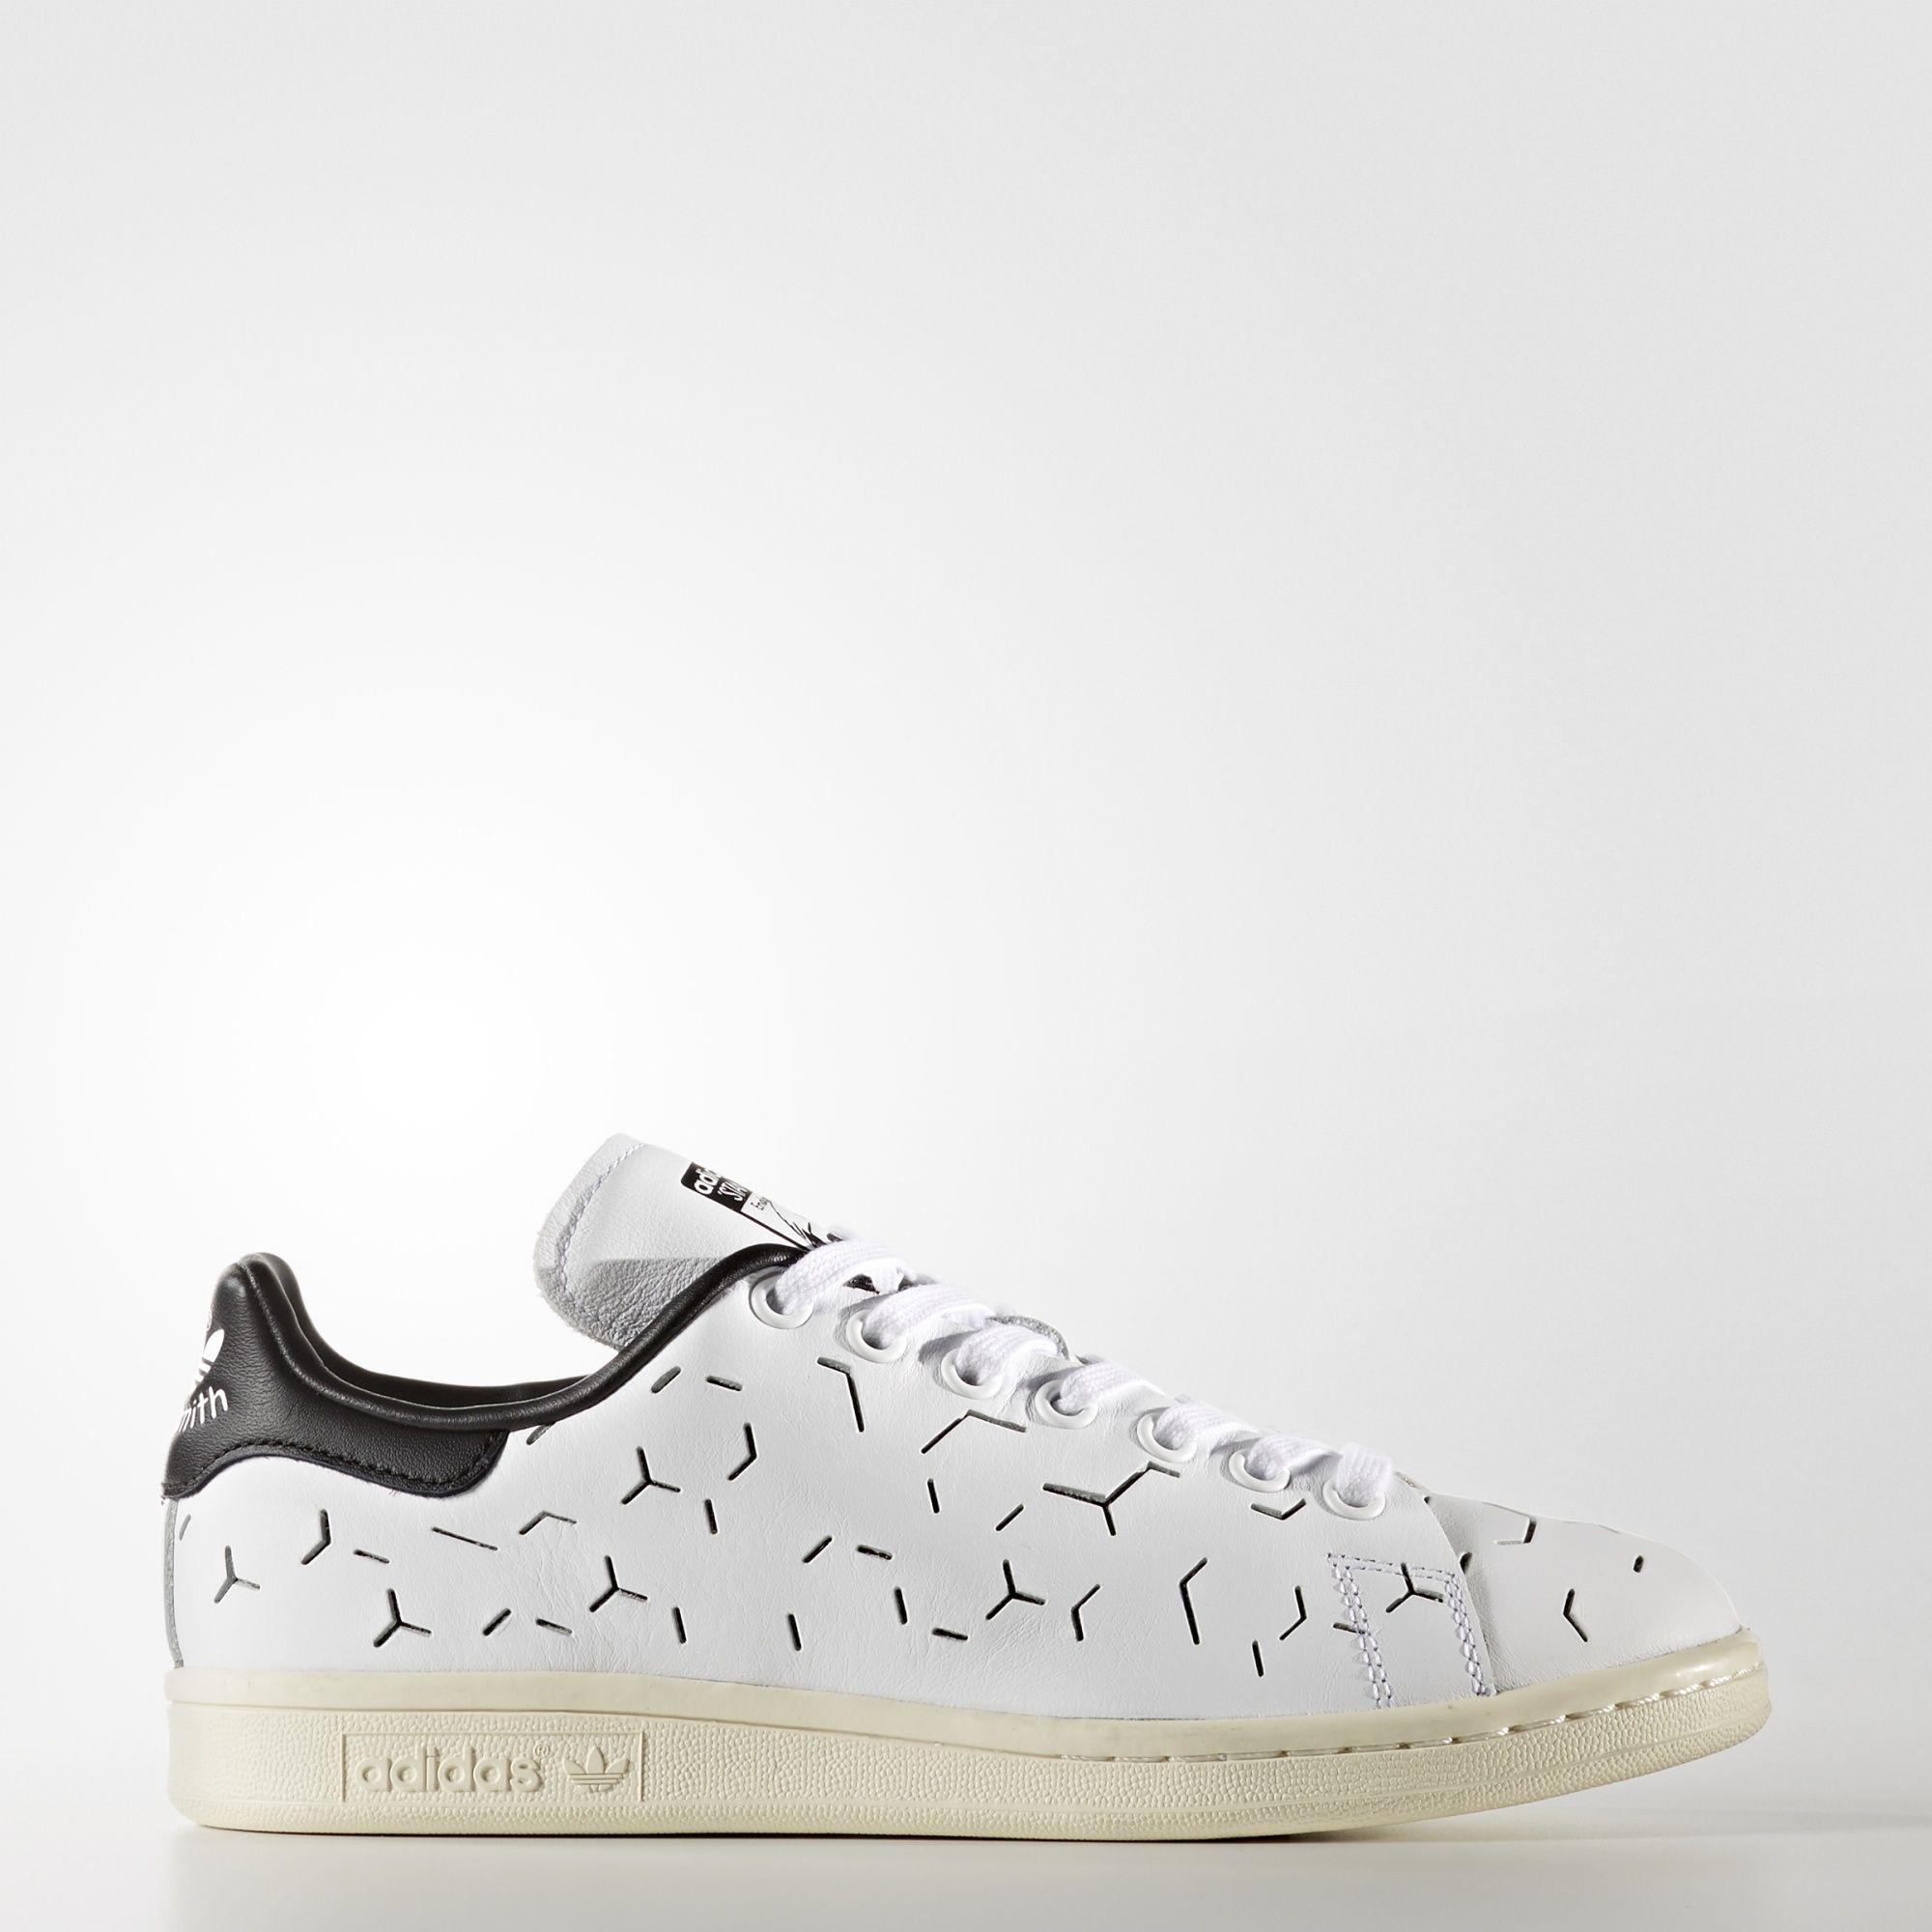 Marque célèbre adidas Stan Smith Flowers Femme Chaussures